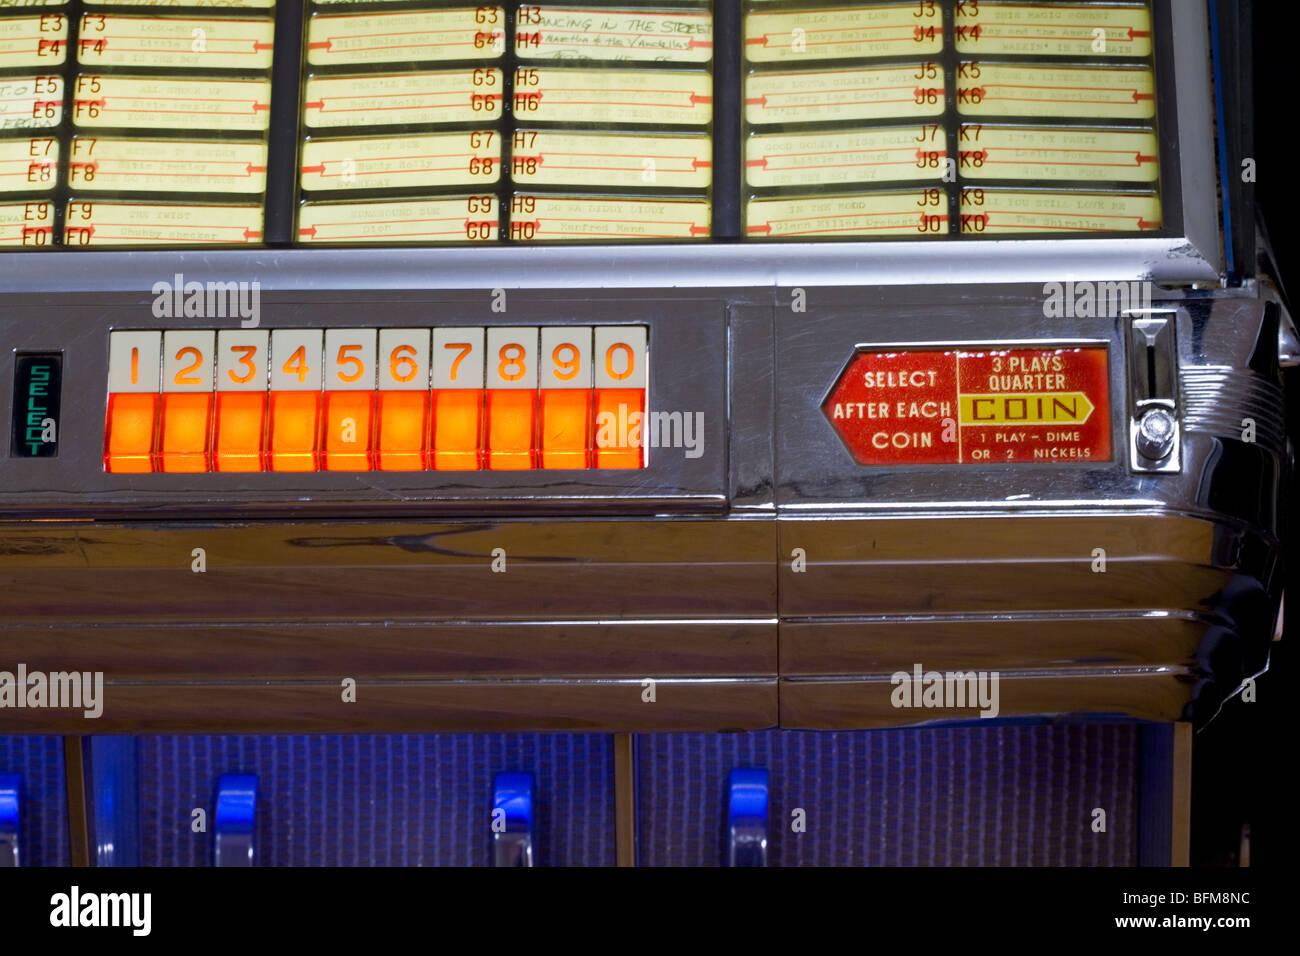 Antique, vintage Seeburg Jukebox 1950s music player - Stock Image